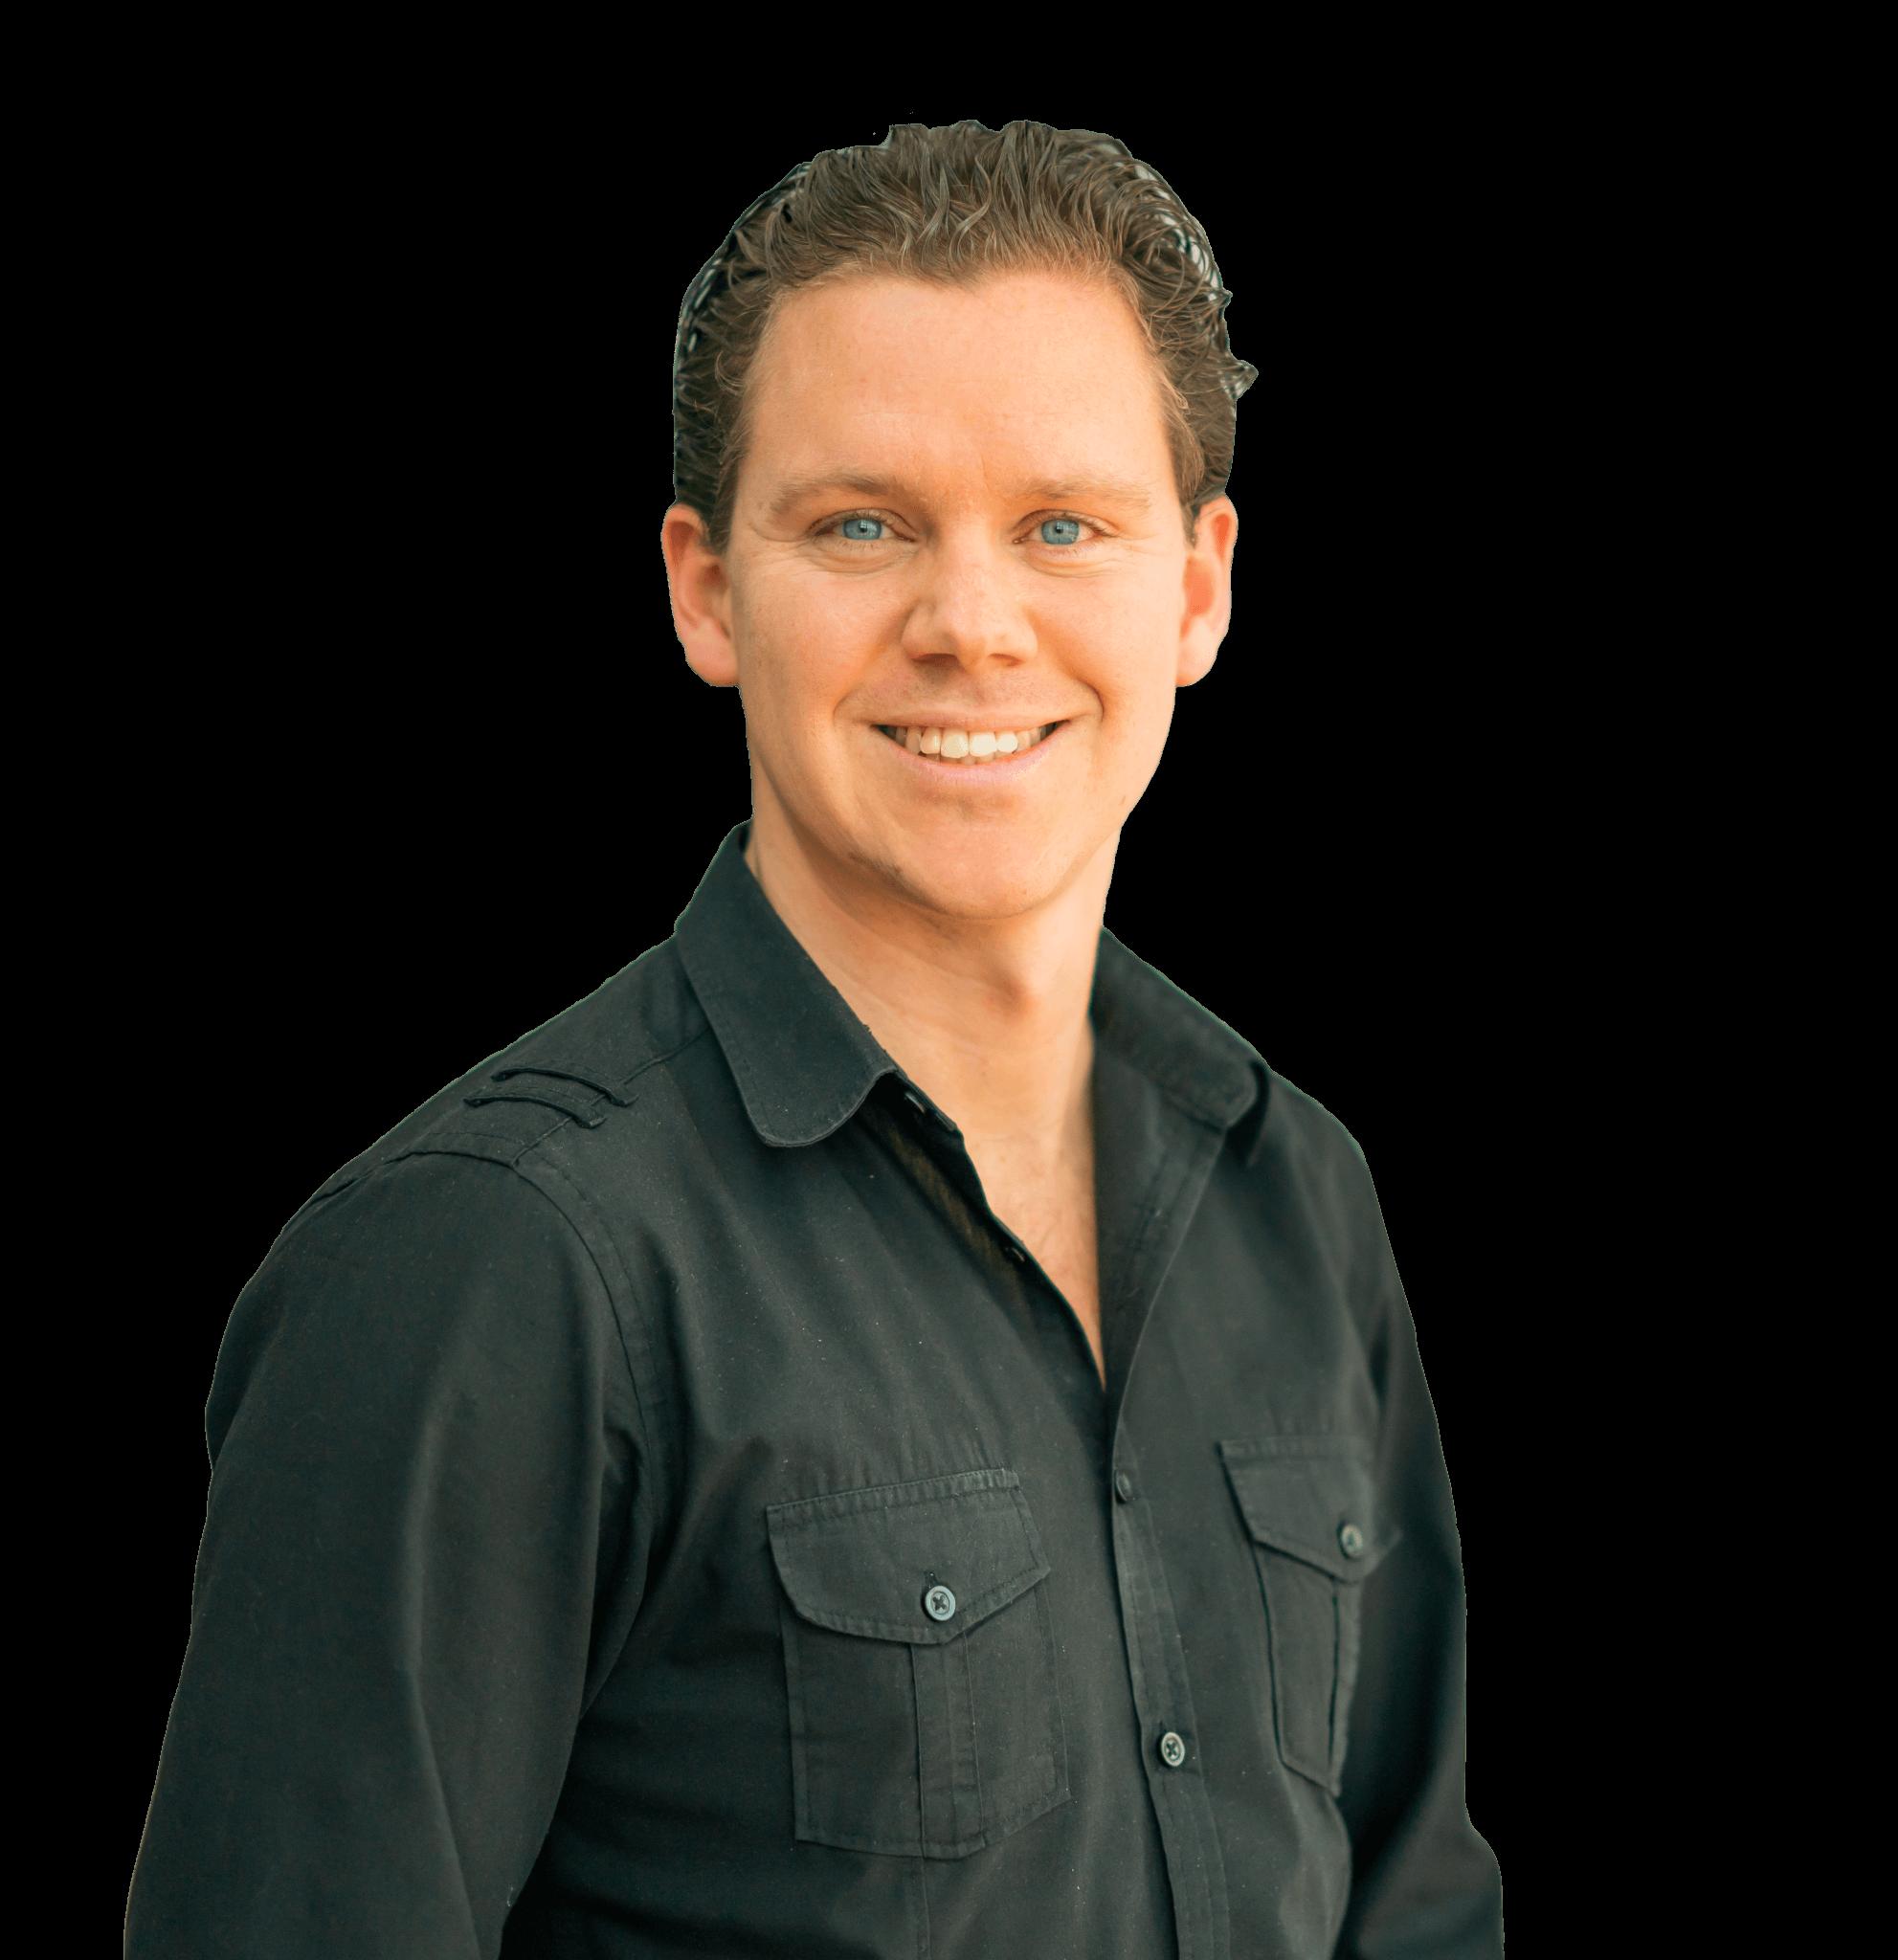 Spot Online medewerker Michael Tijm